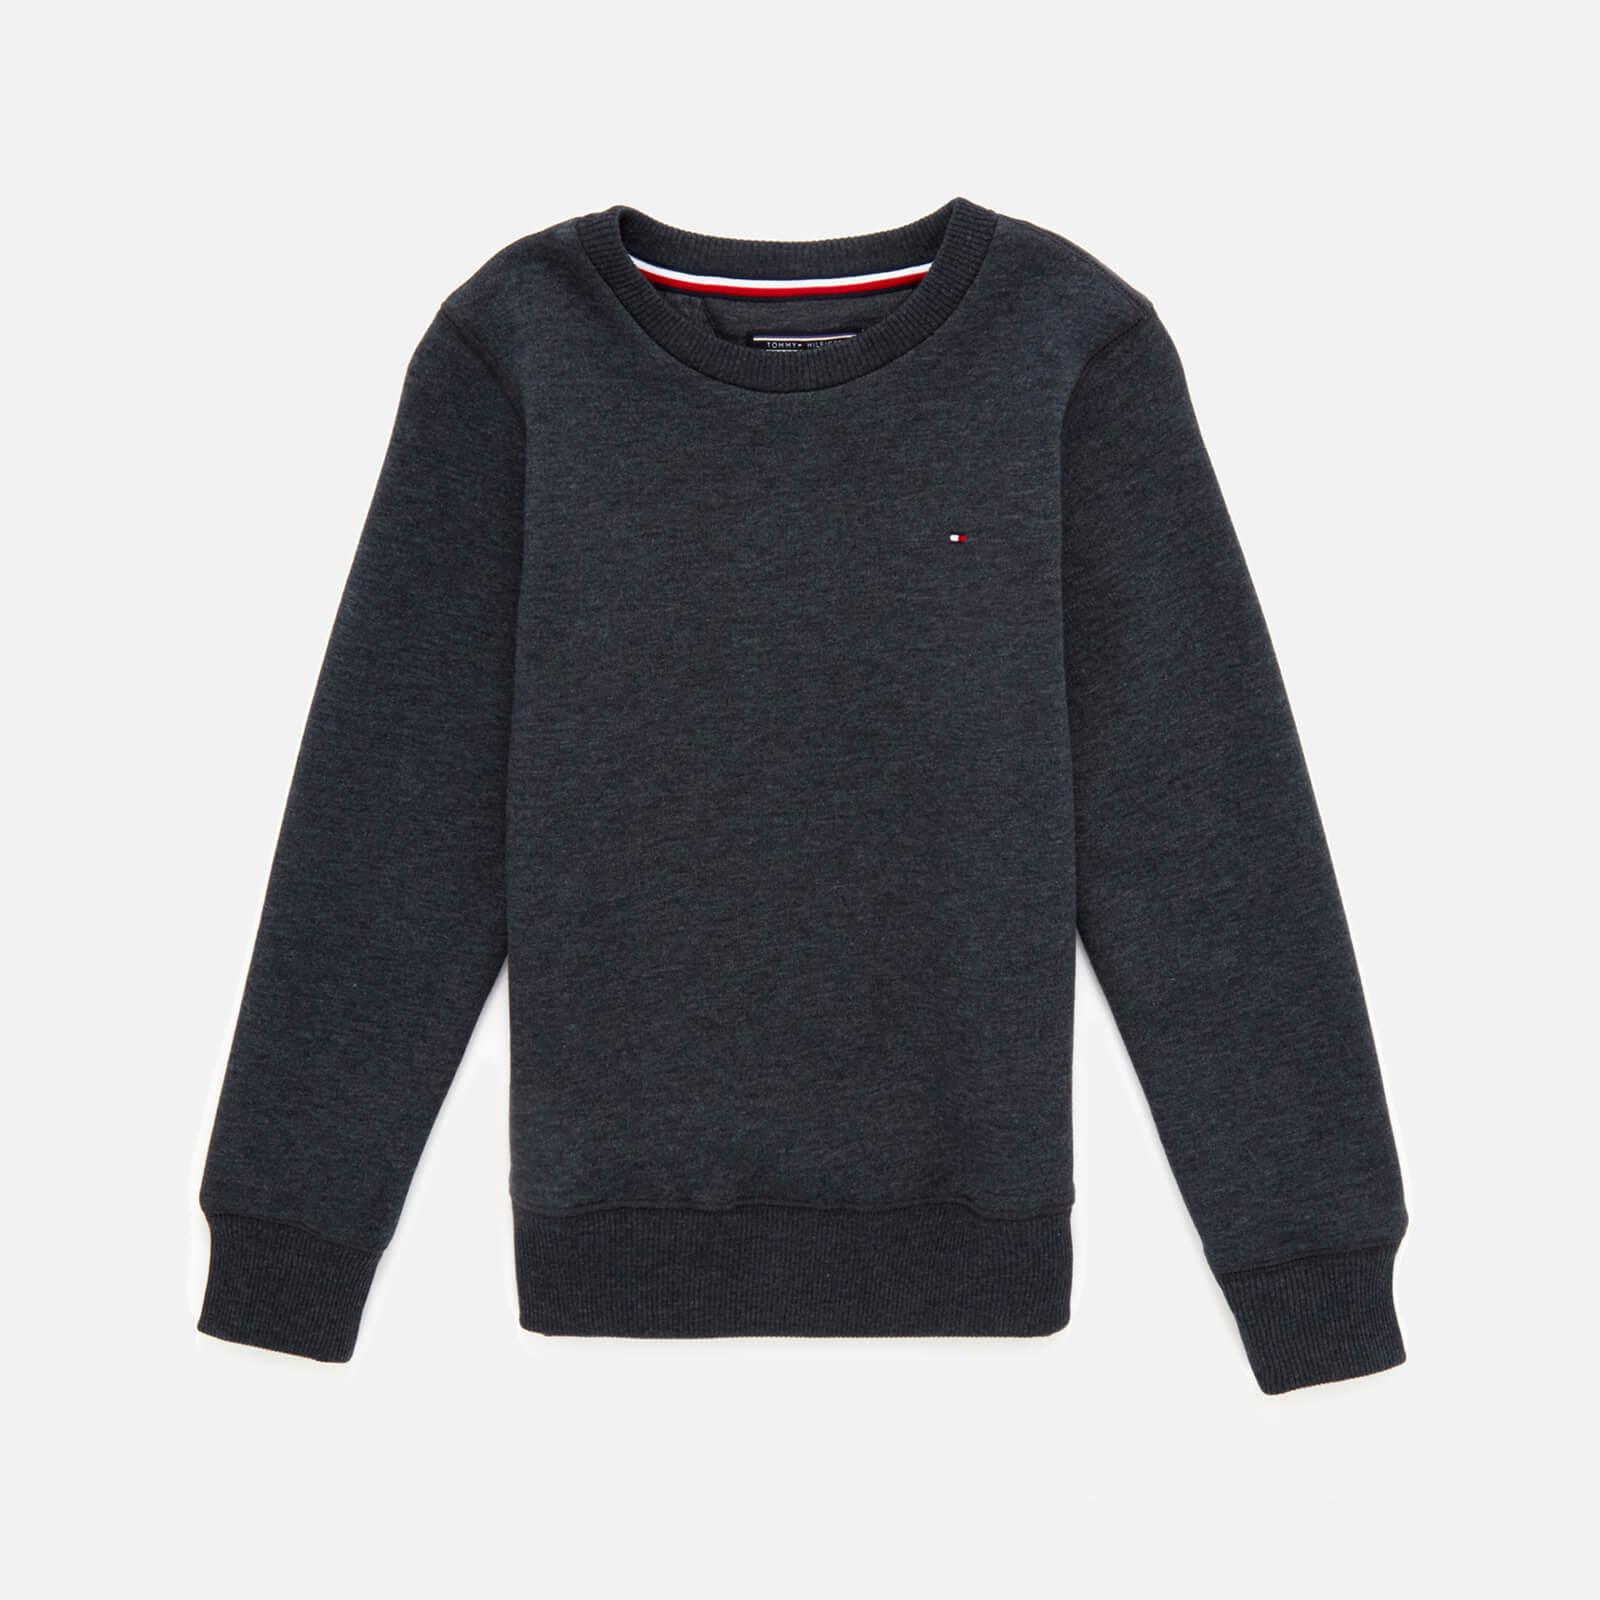 Tommy Kids Boys' Basic Sweatshirt - Sky Captain - 6 Years